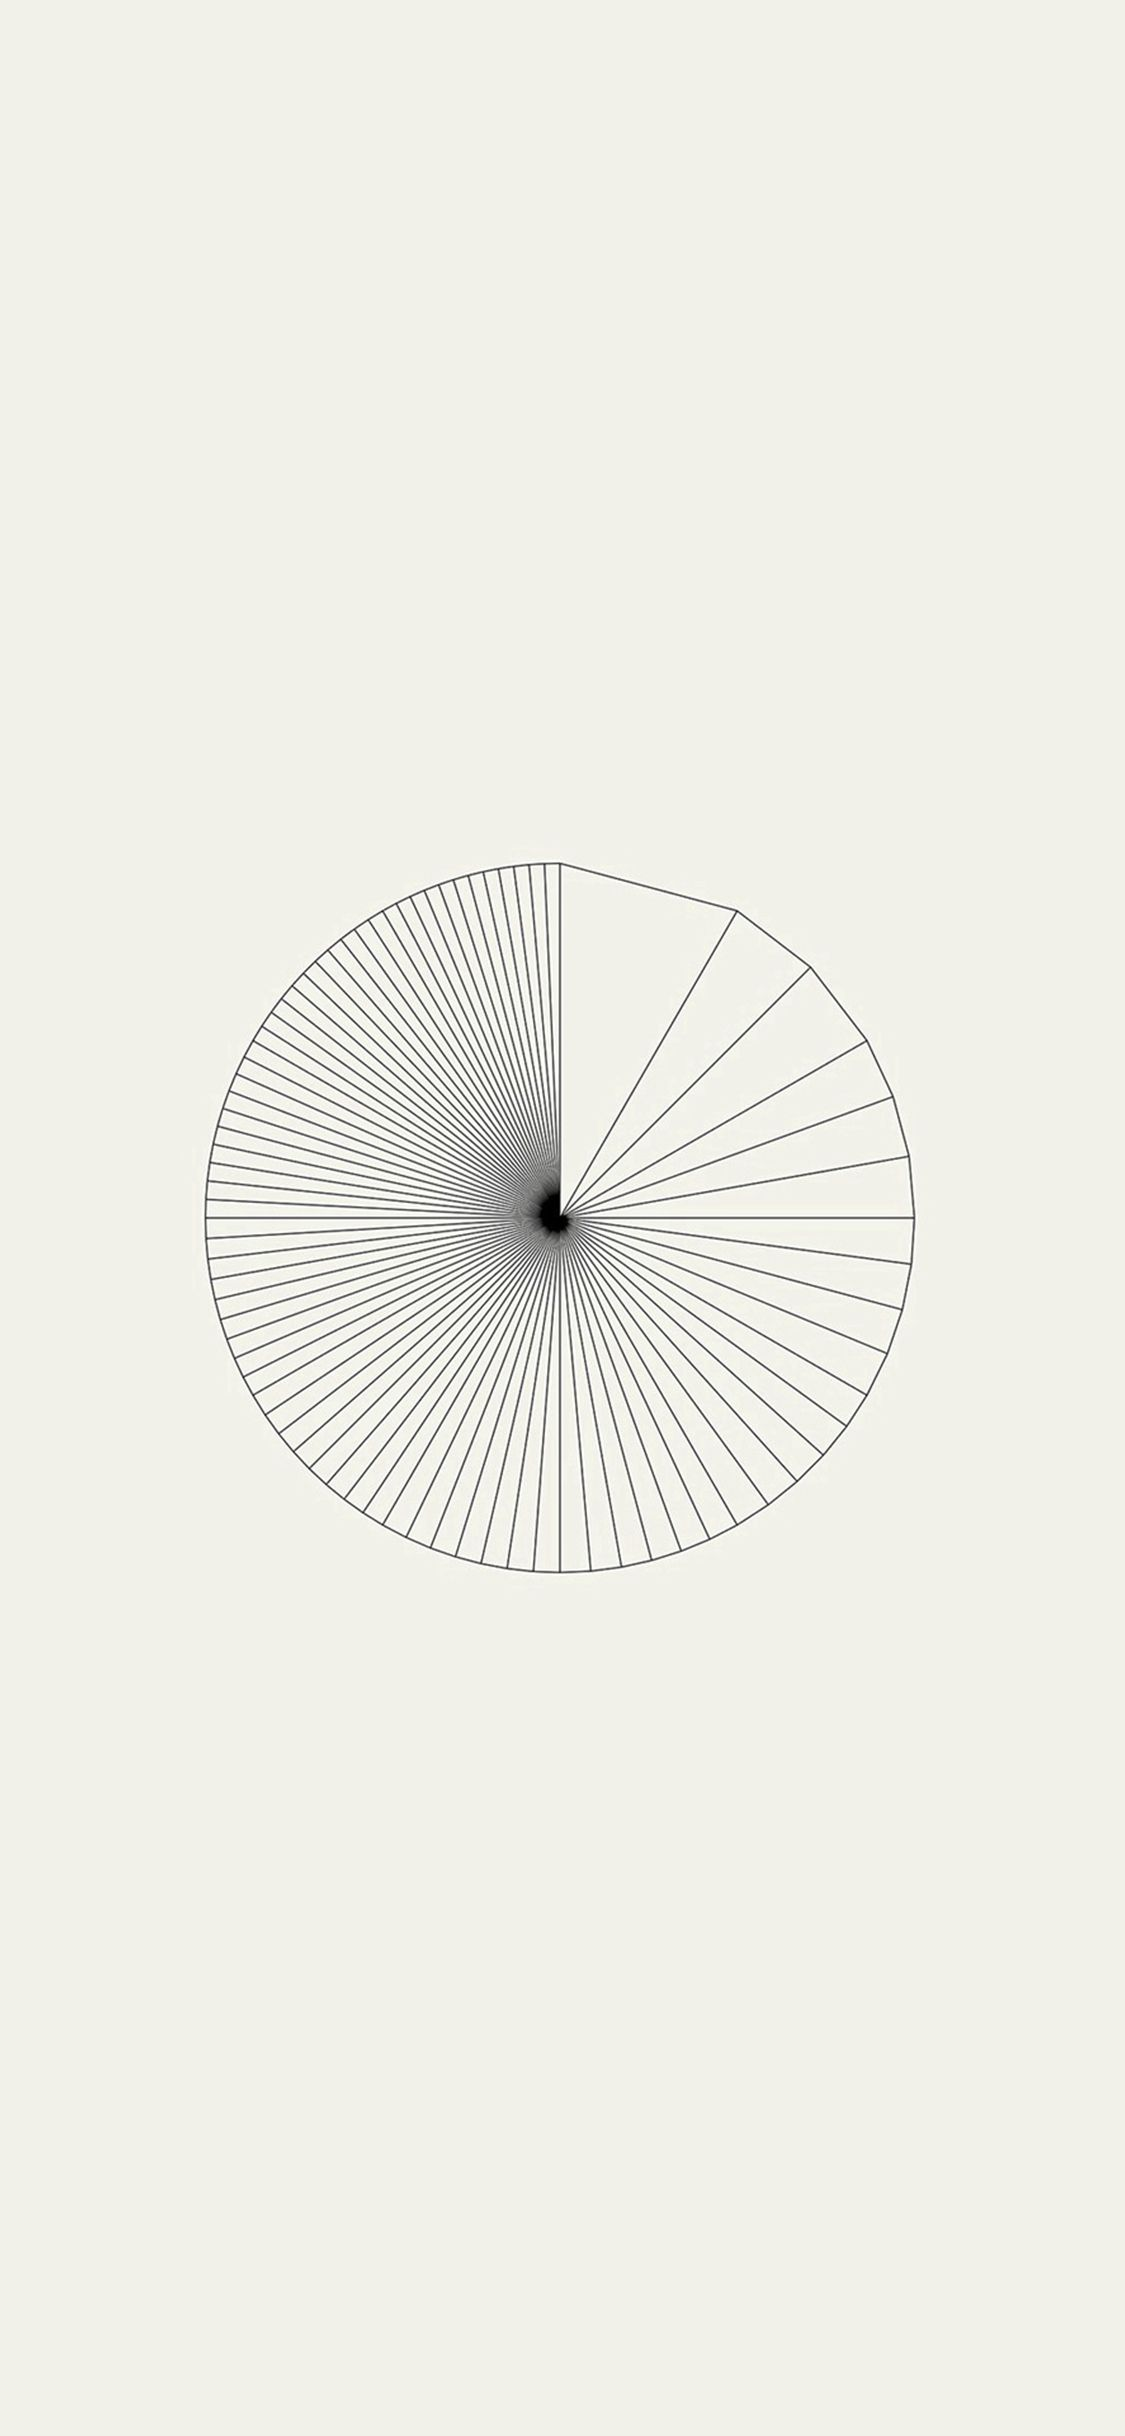 Slides Minimal Art Simple iPhone X wallpaper